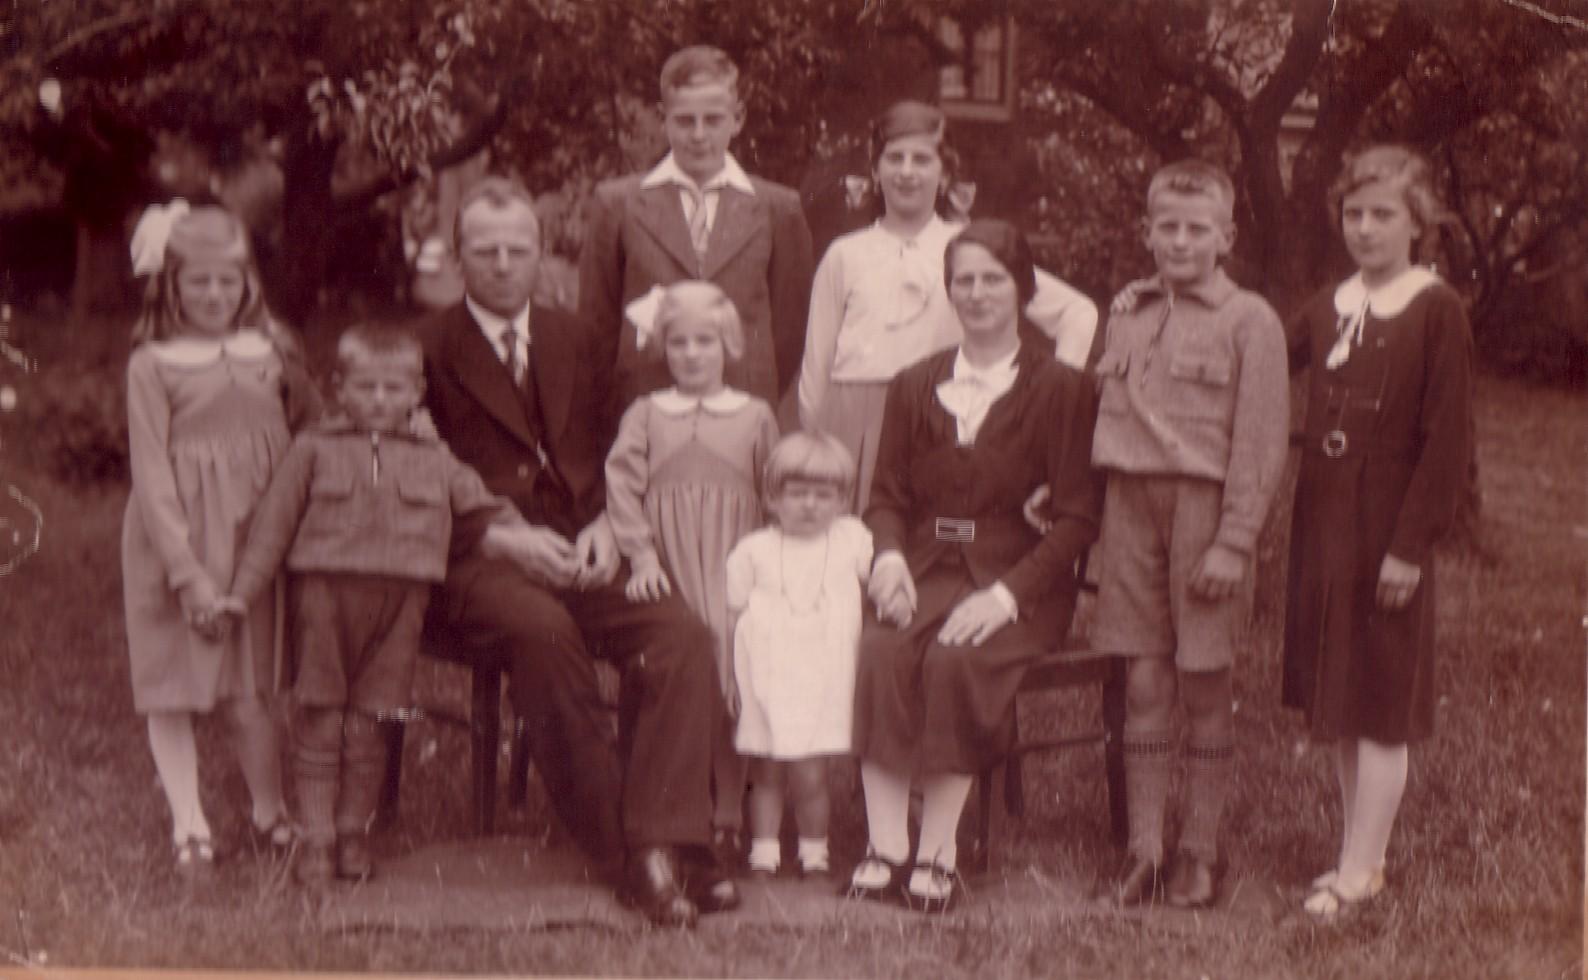 Fam Marinus C.Keijzer en Jozina J. Romeijn in 1946